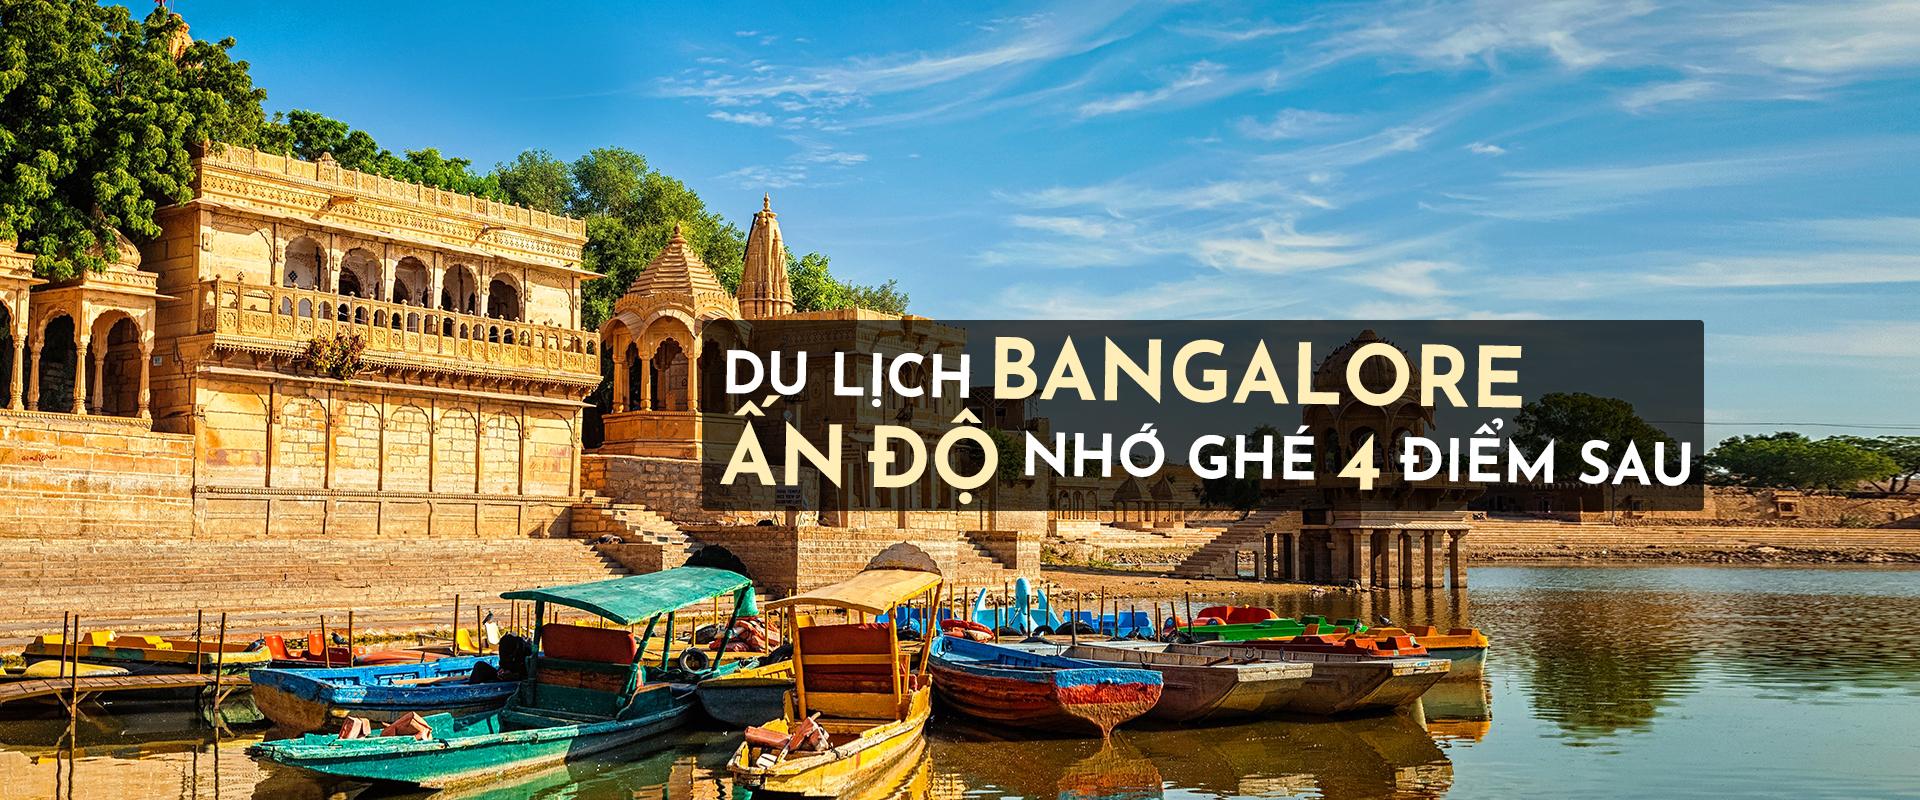 Du lịch Bangalore Ấn Độ nhớ ghé 4 điểm sau